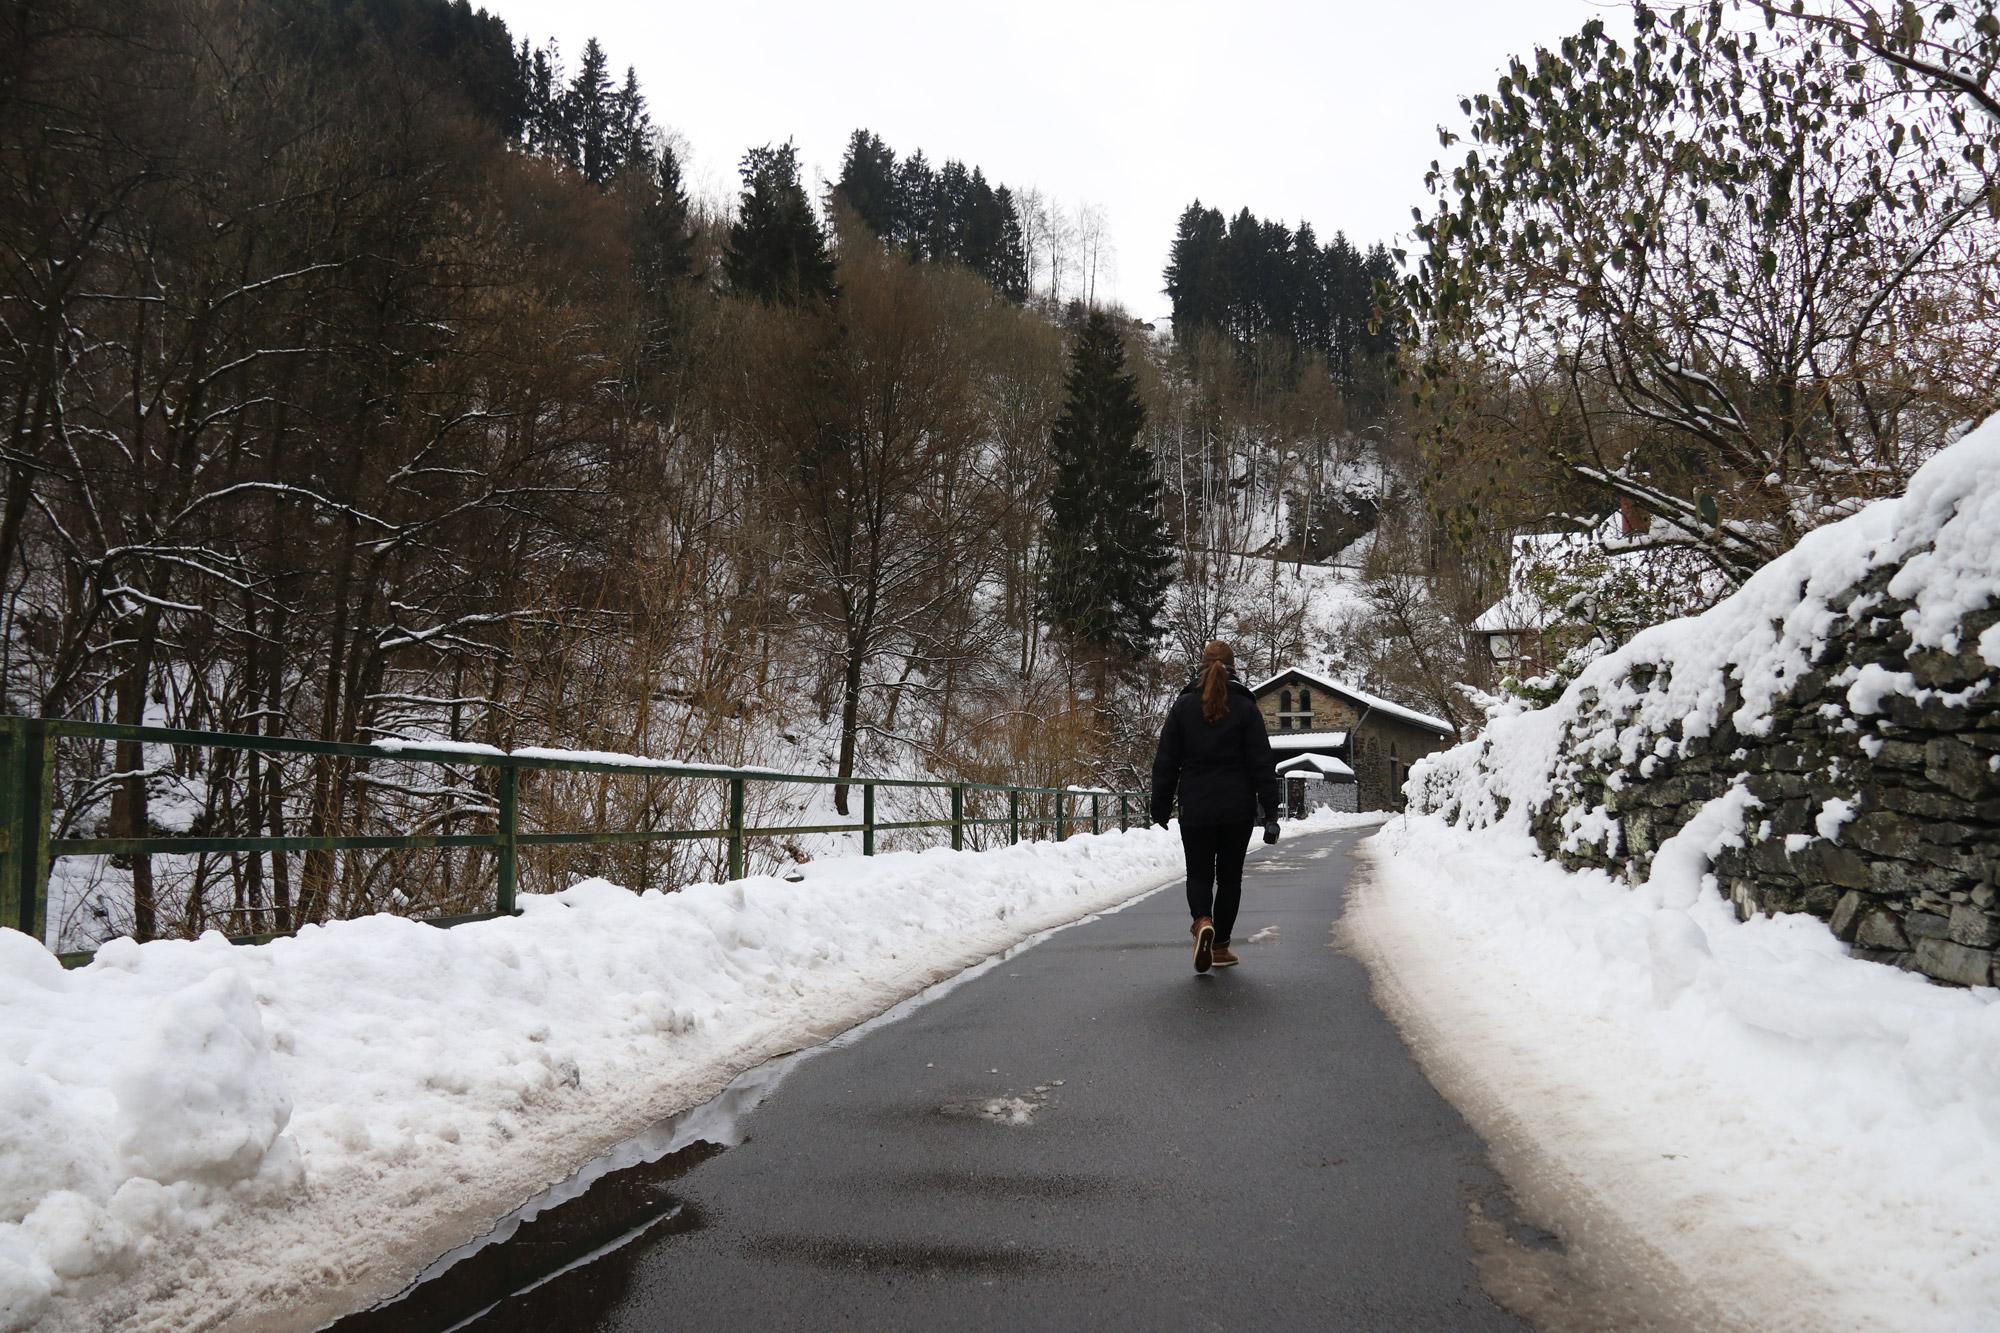 Stedentrip Monschau - Wandelen in de omgeving